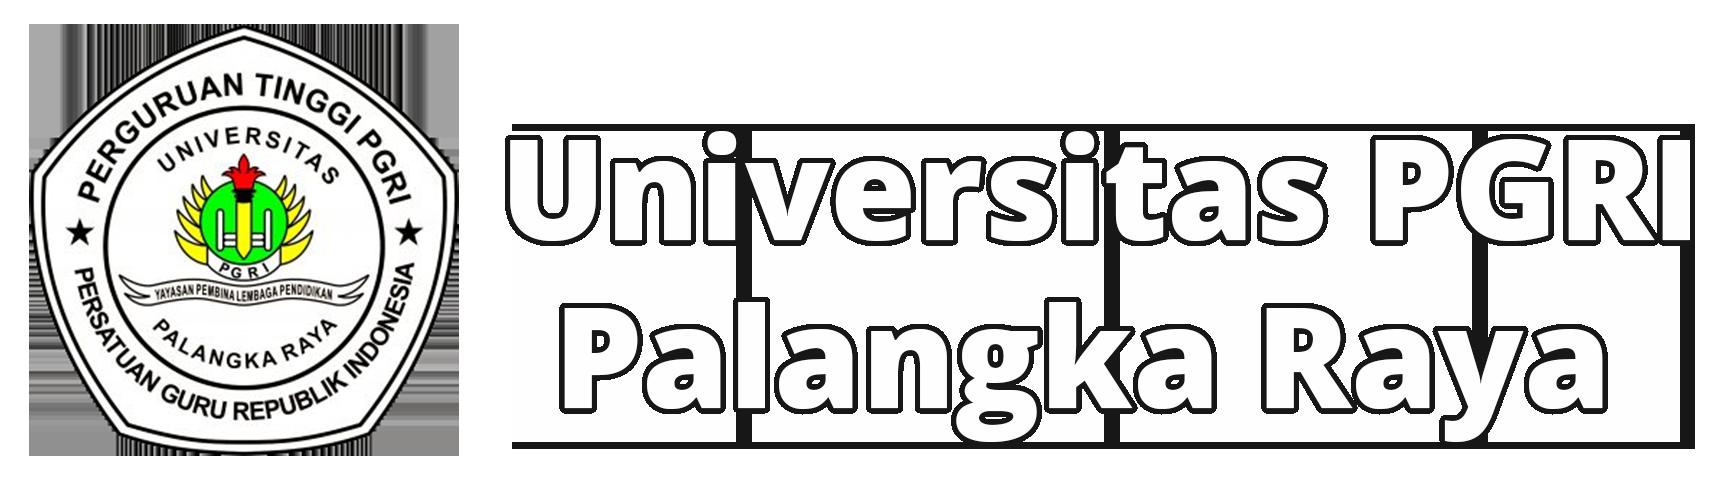 Universitas PGRI Palangka Raya